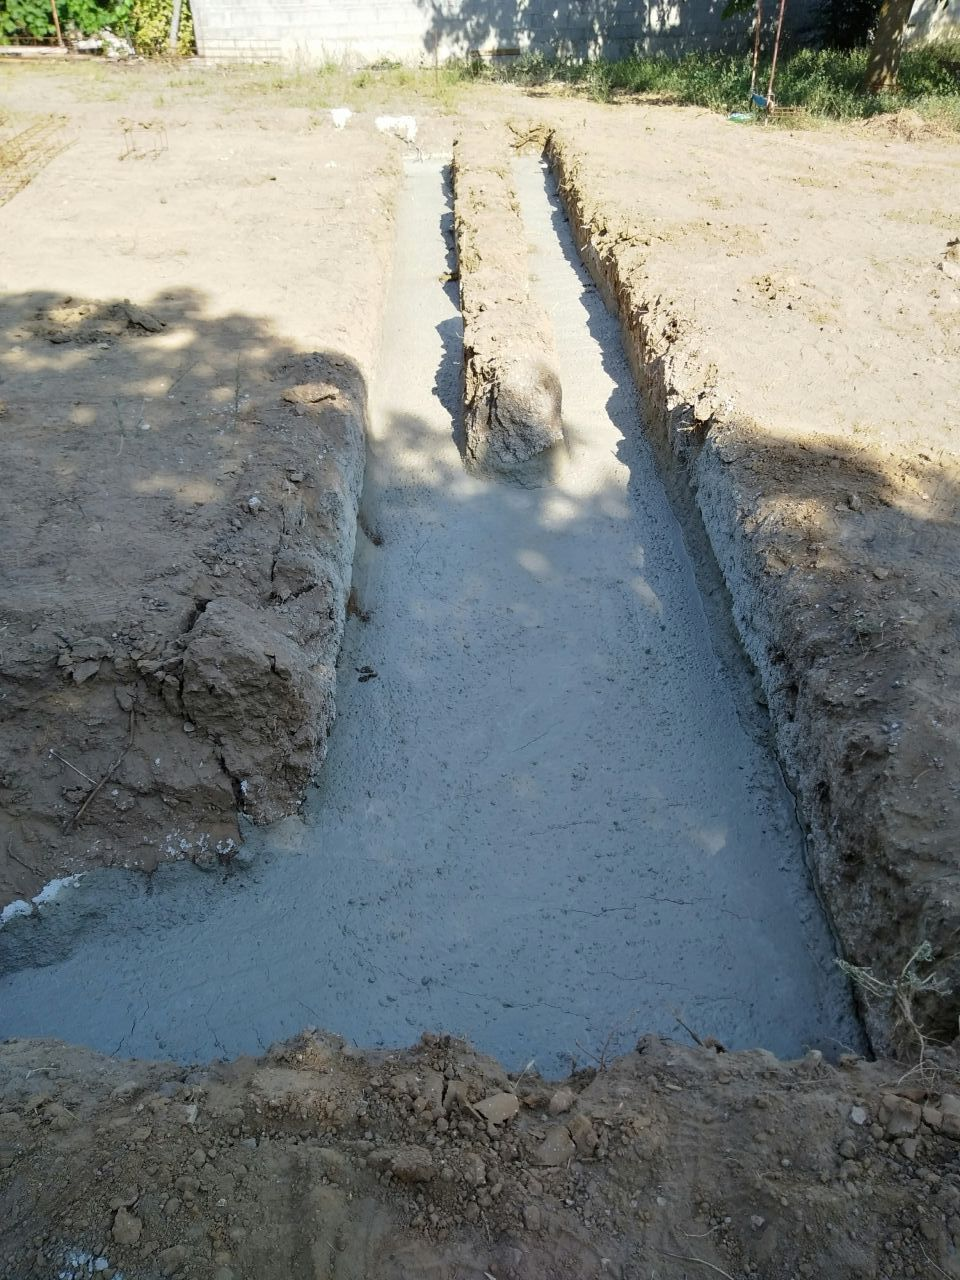 Gros béton fondation coulé